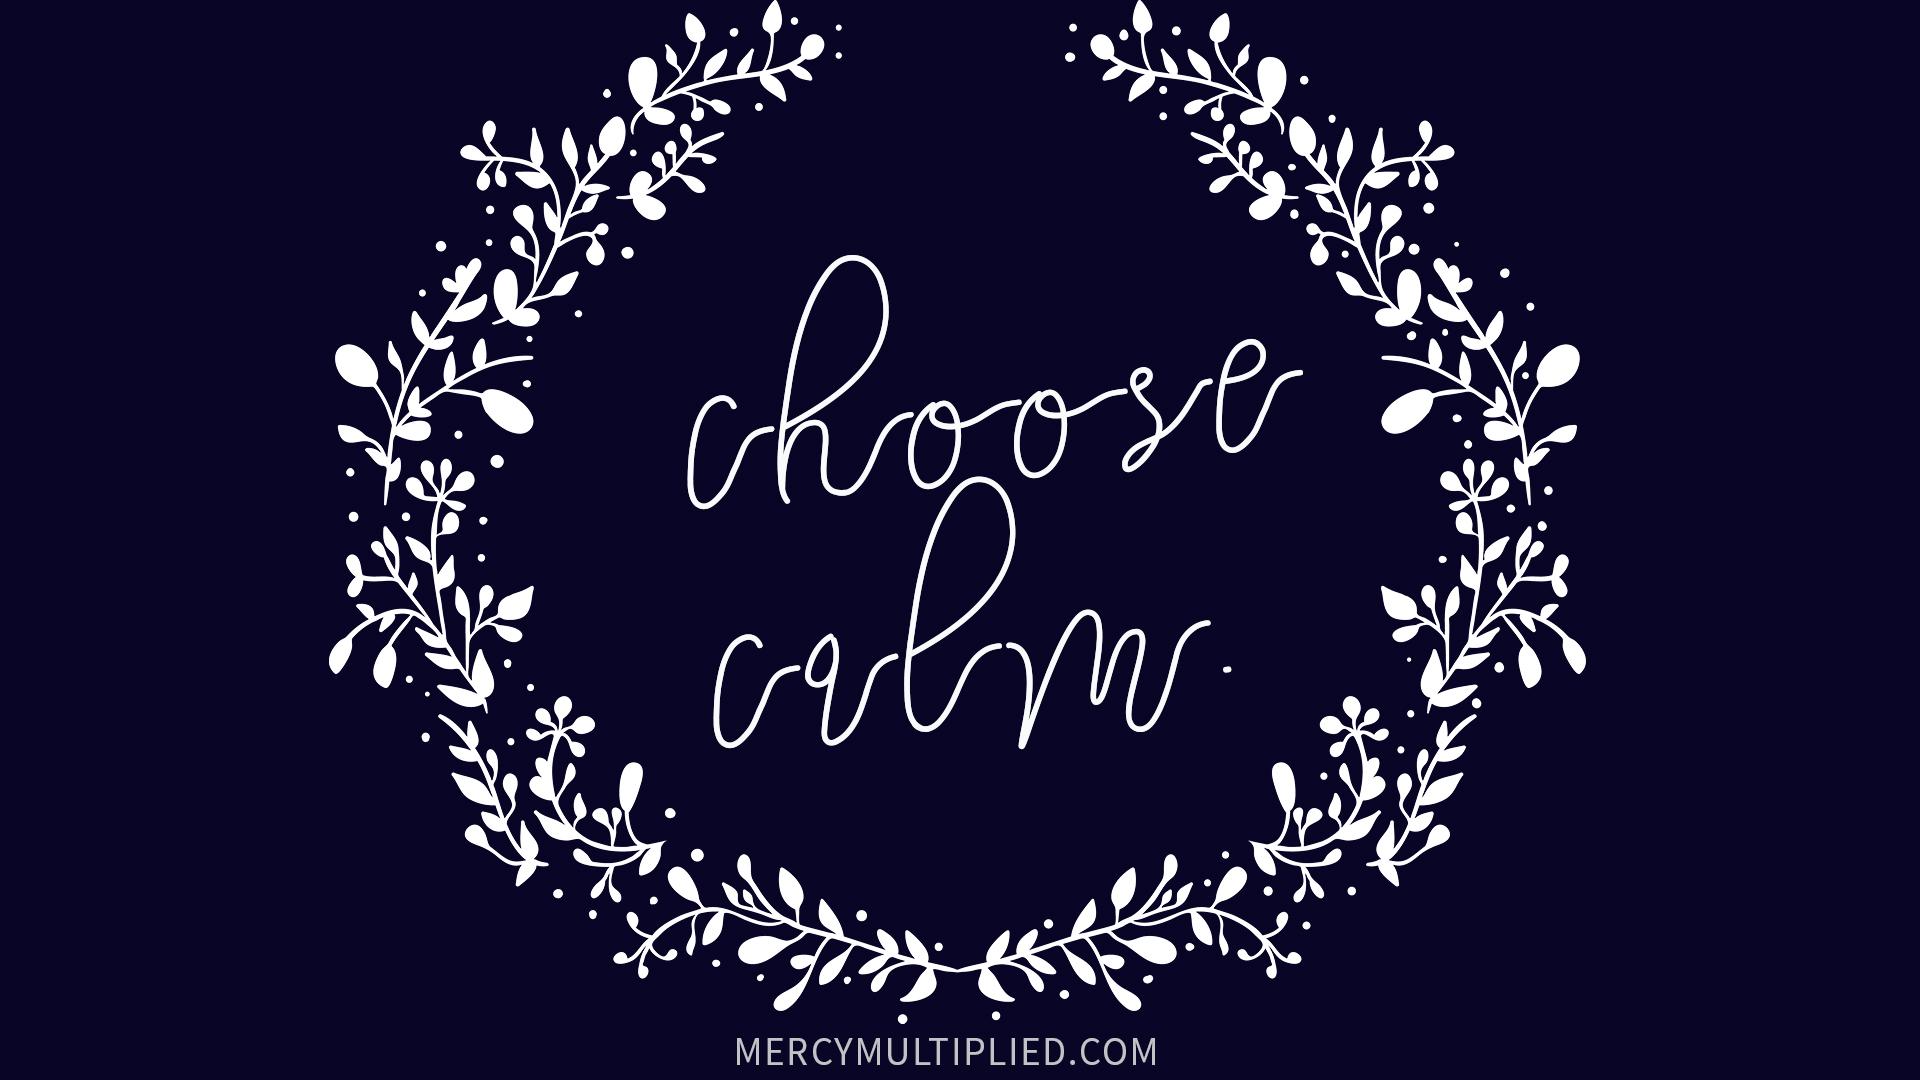 Choose Calm Computer Wallpaper Download | mercymultipliedblog.com